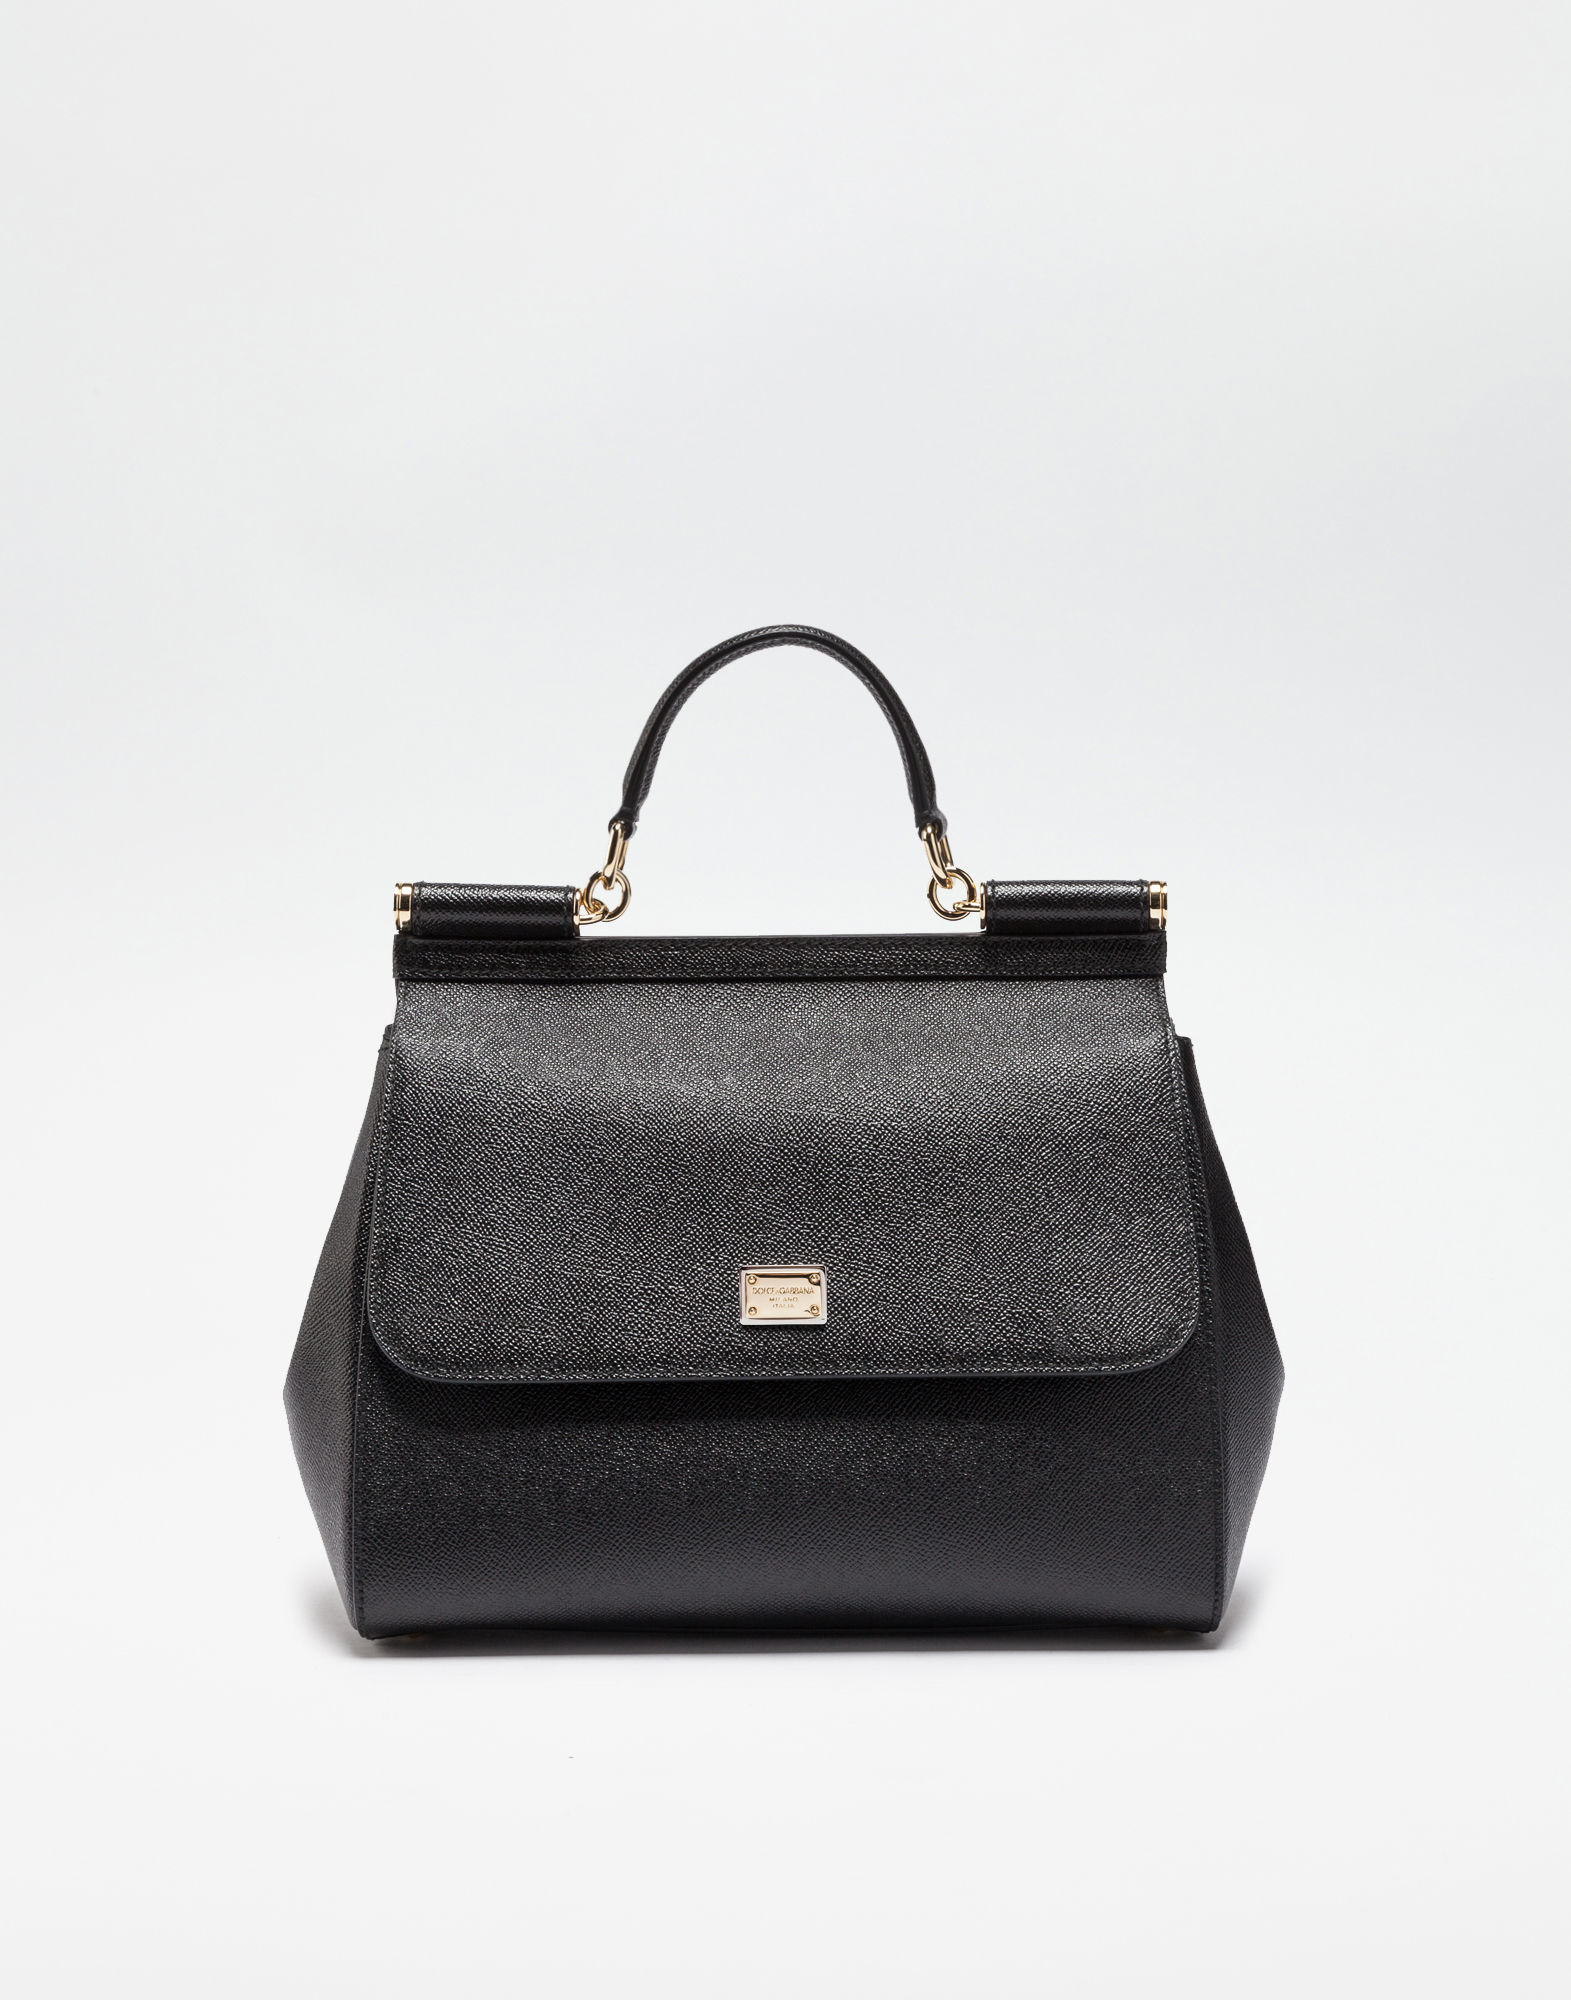 Dolce & Gabbana Medium Sicily Handbag In Dauphine Leather In Black